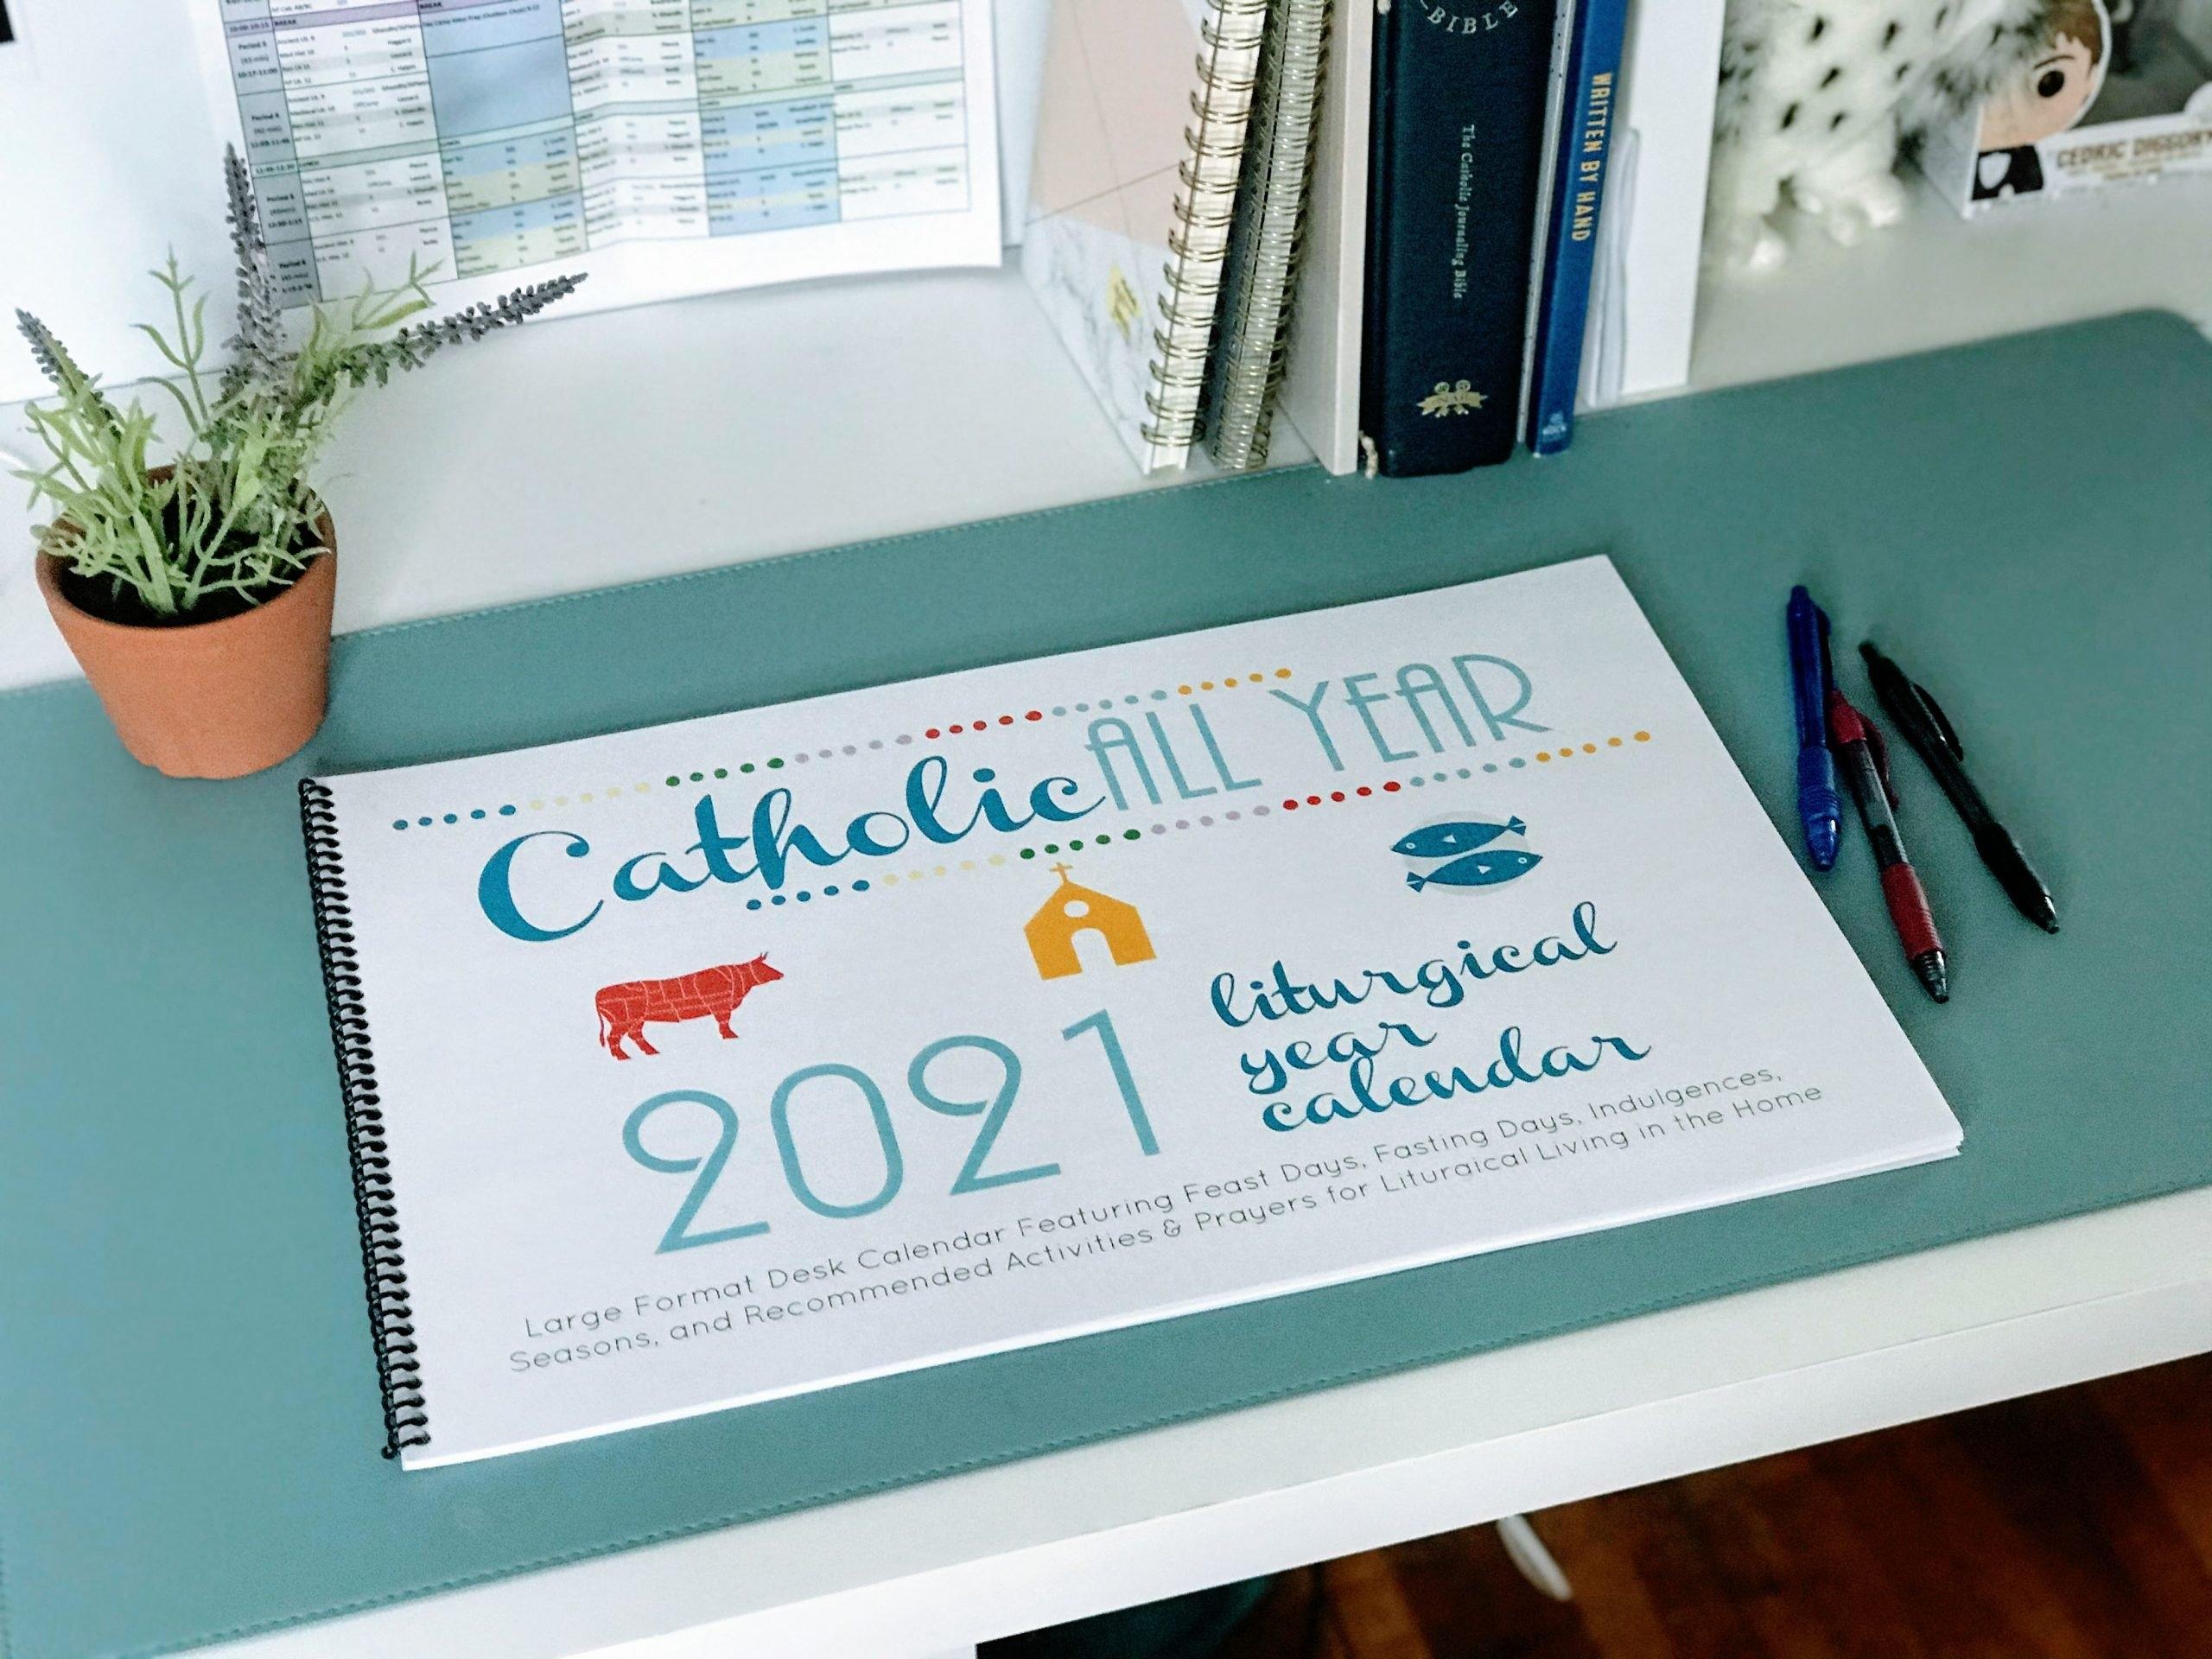 Catholic All Year 2021 Liturgical Desk Calendar Large Format 11X17 *Digital Download* - Catholic within Image Of 2021 Church Calendar Photo